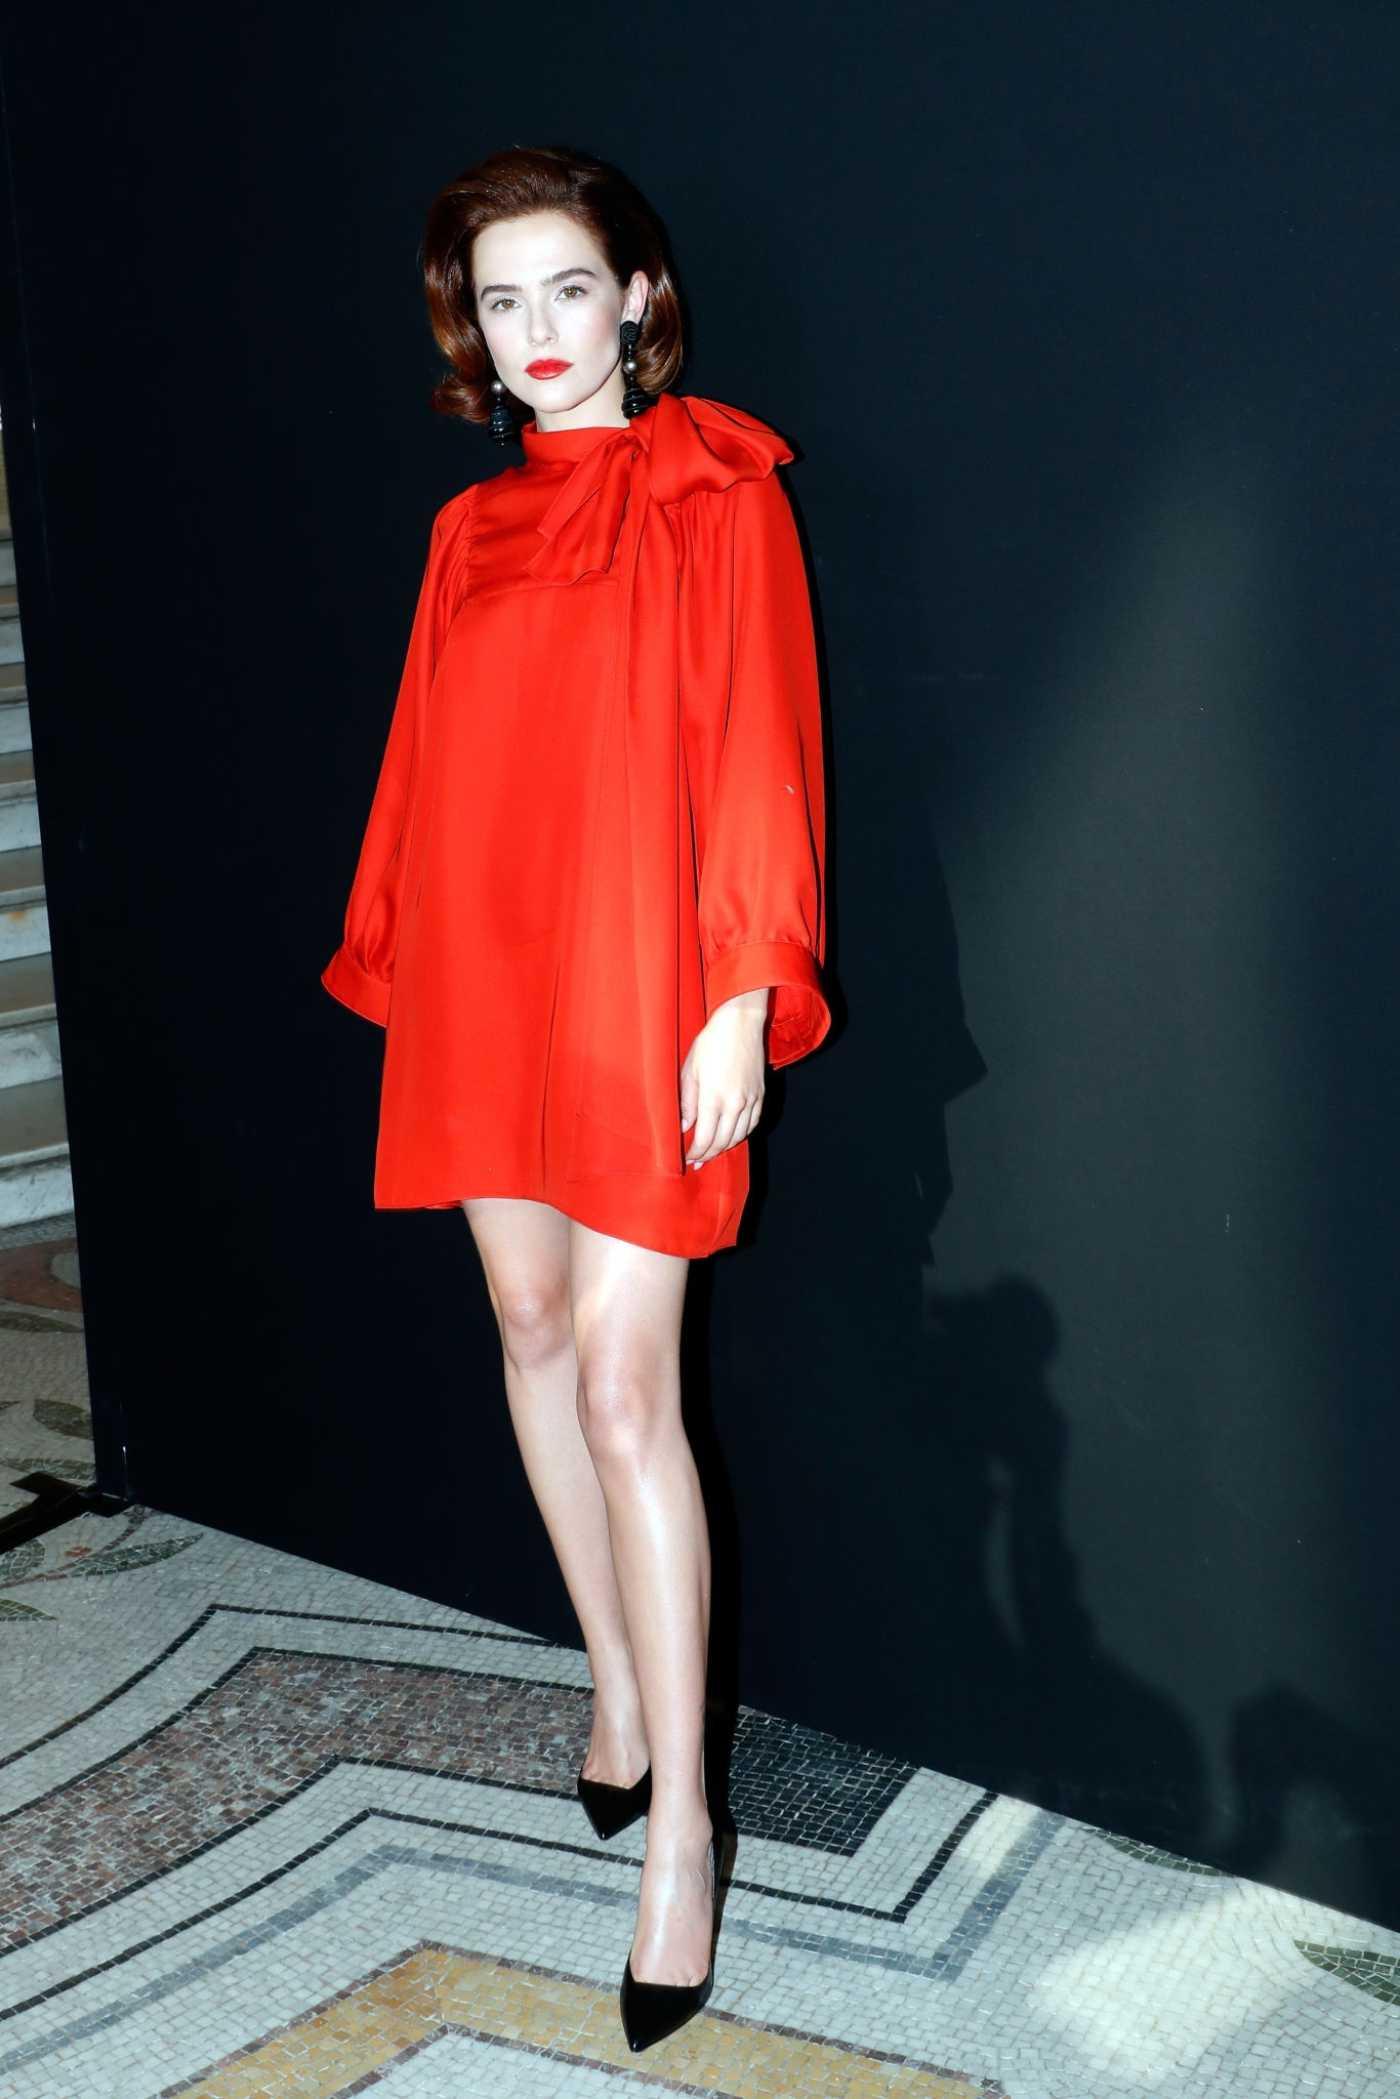 Zoey Deutch Attends the Giorgio Armani Show During 2019 Paris Fashion Week in Paris 07/02/2019